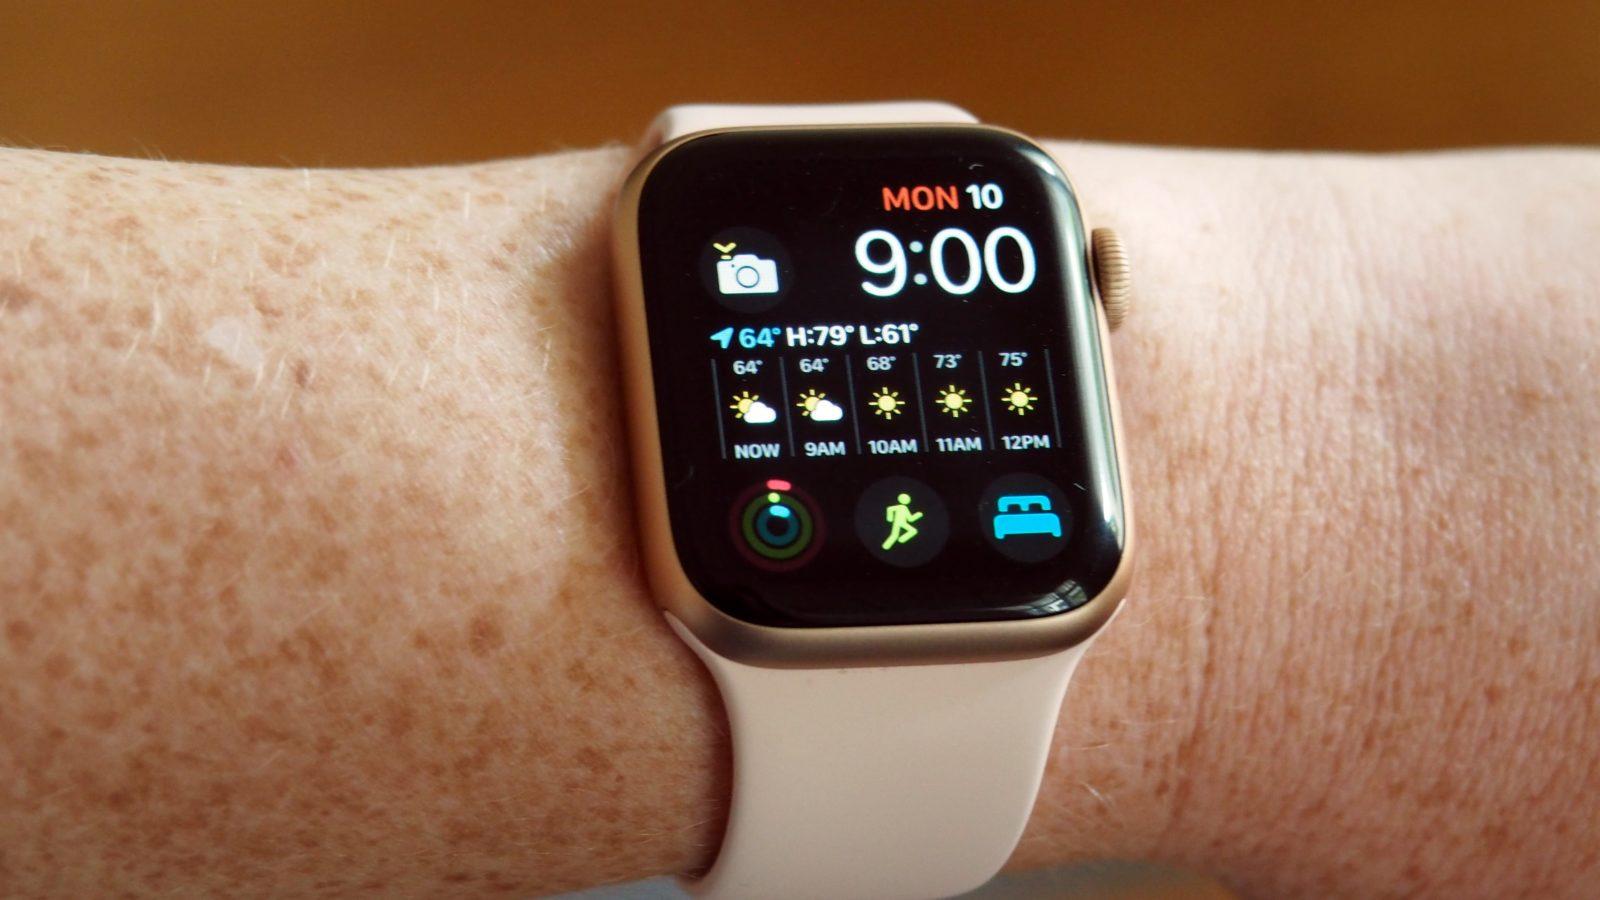 Apple Watch com o sistema watchOS 7. Crédito: Caitlin McGarry/Gizmodo